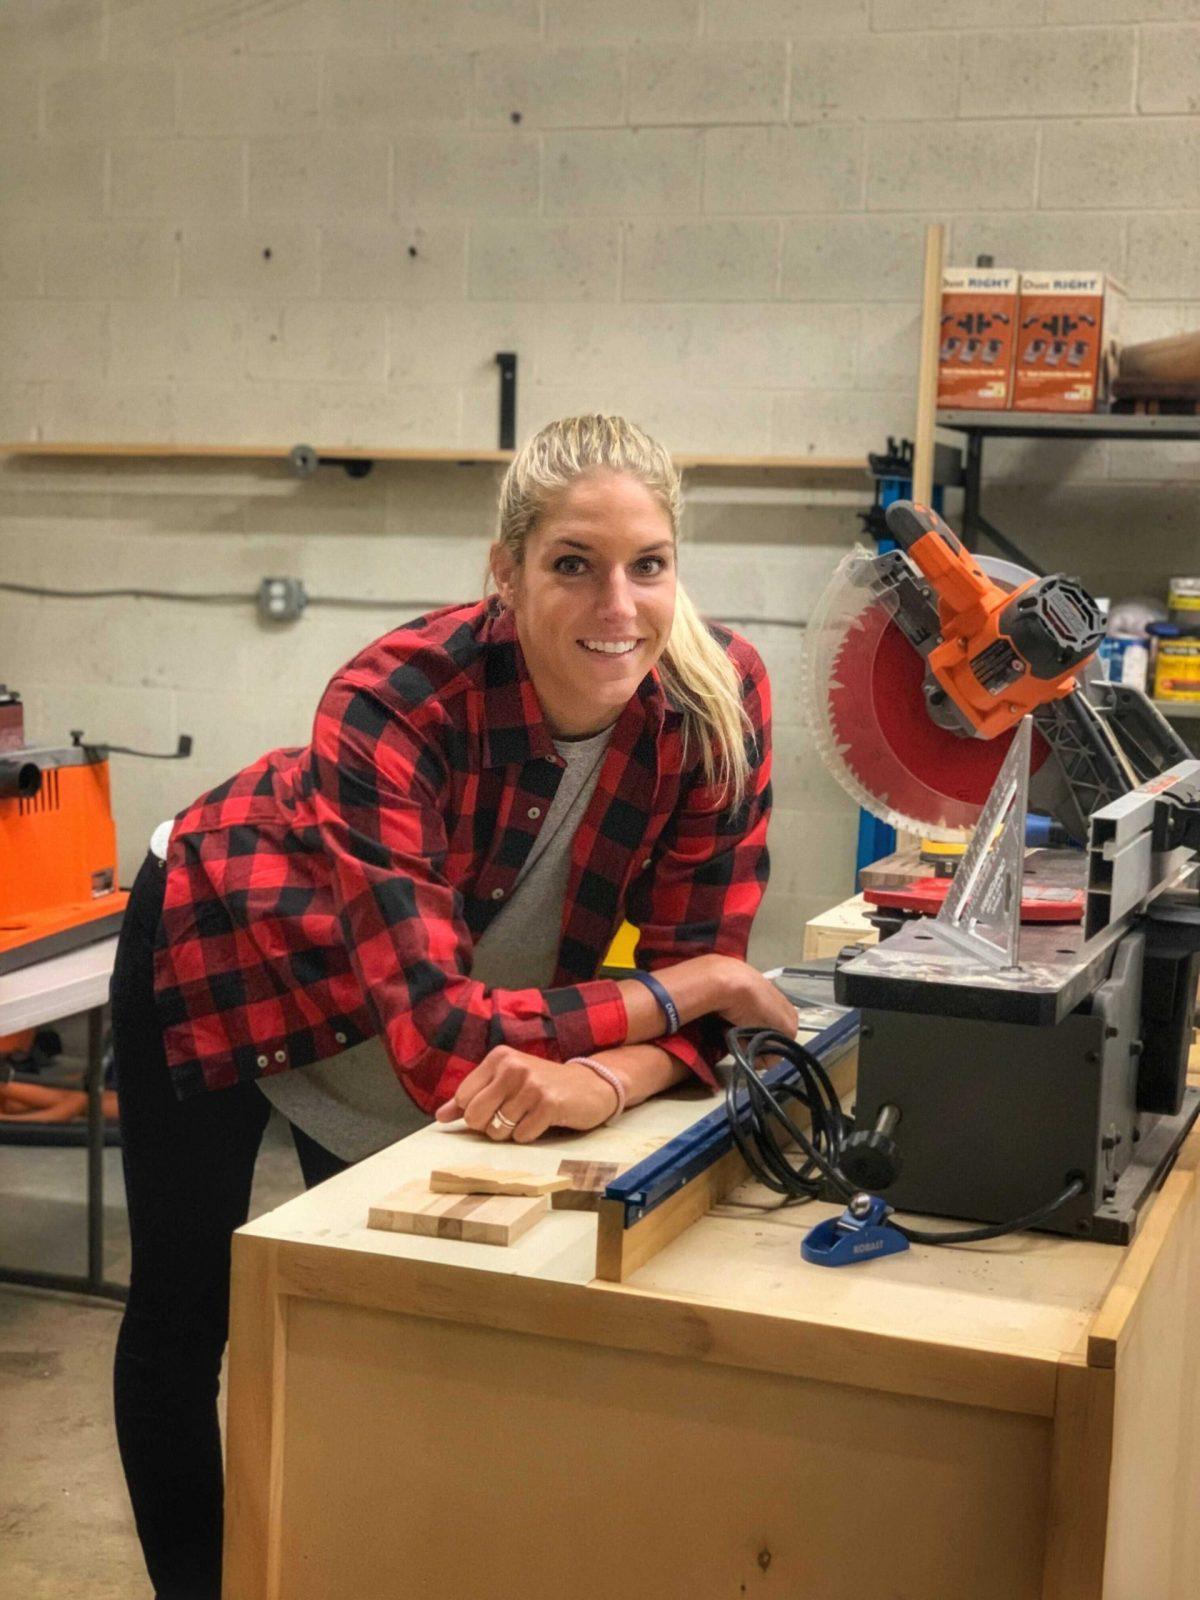 Elena Delle Donne woodworking